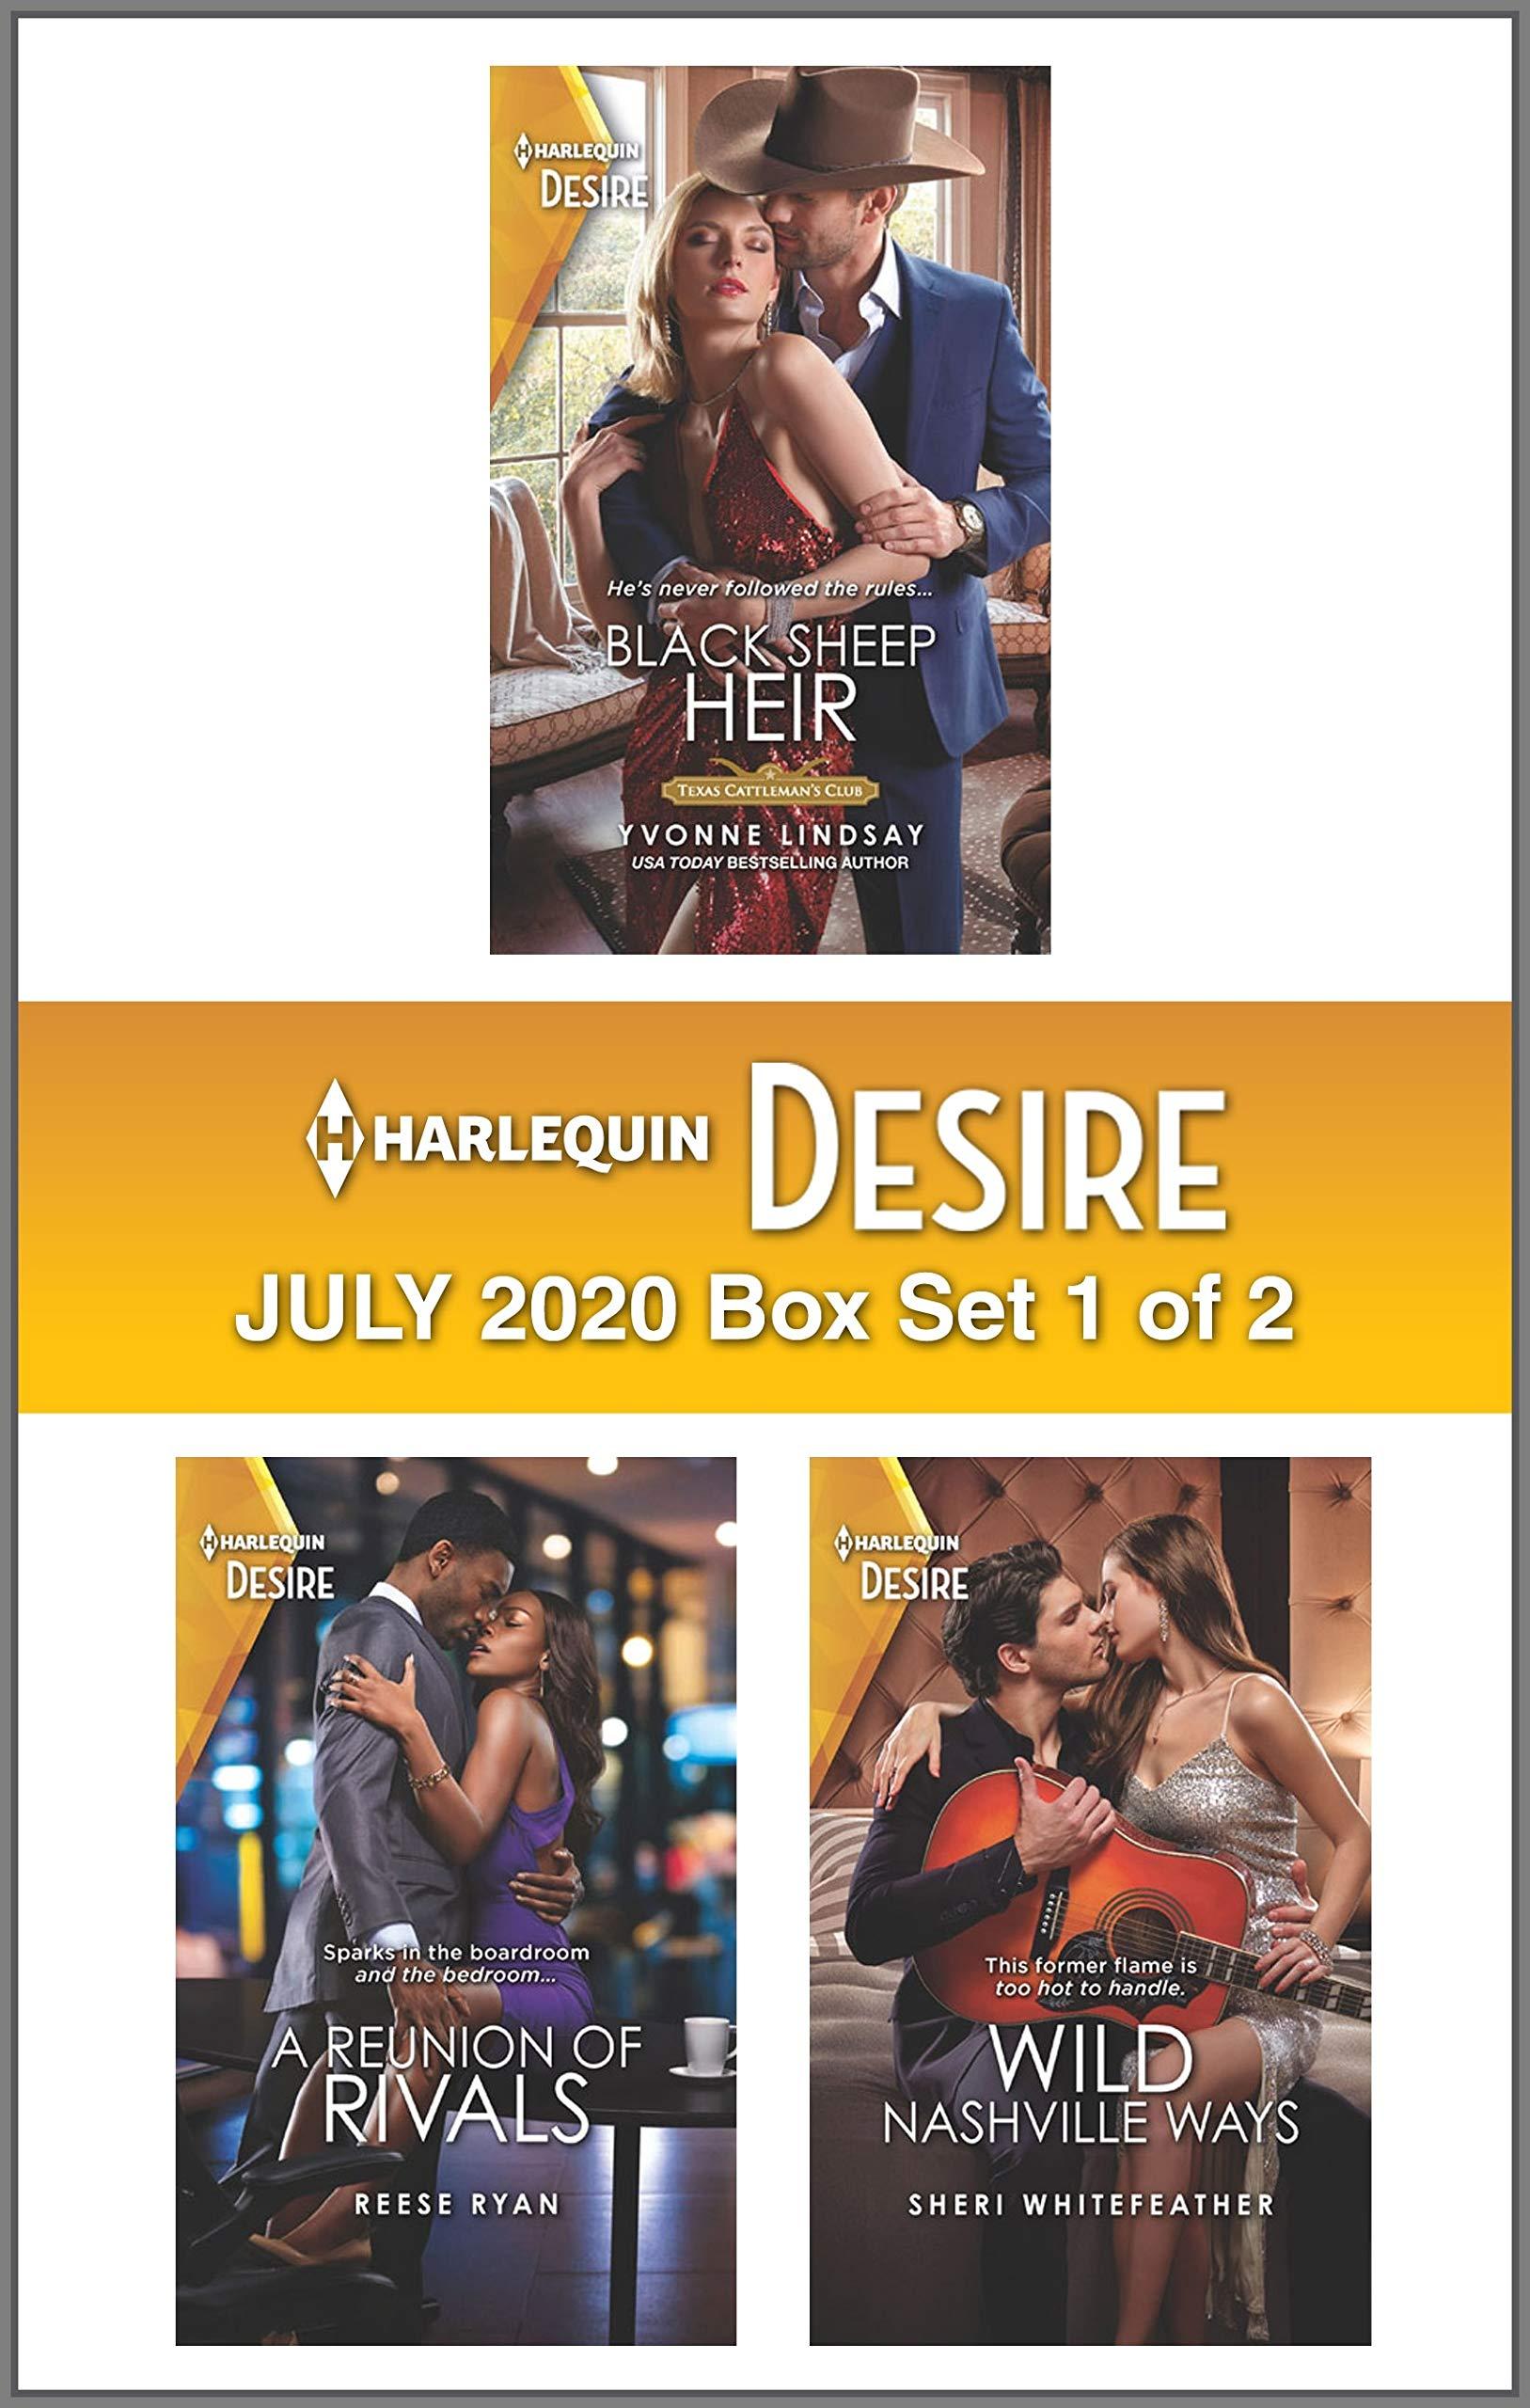 Harlequin Desire July 2020 - Box Set 1 of 2